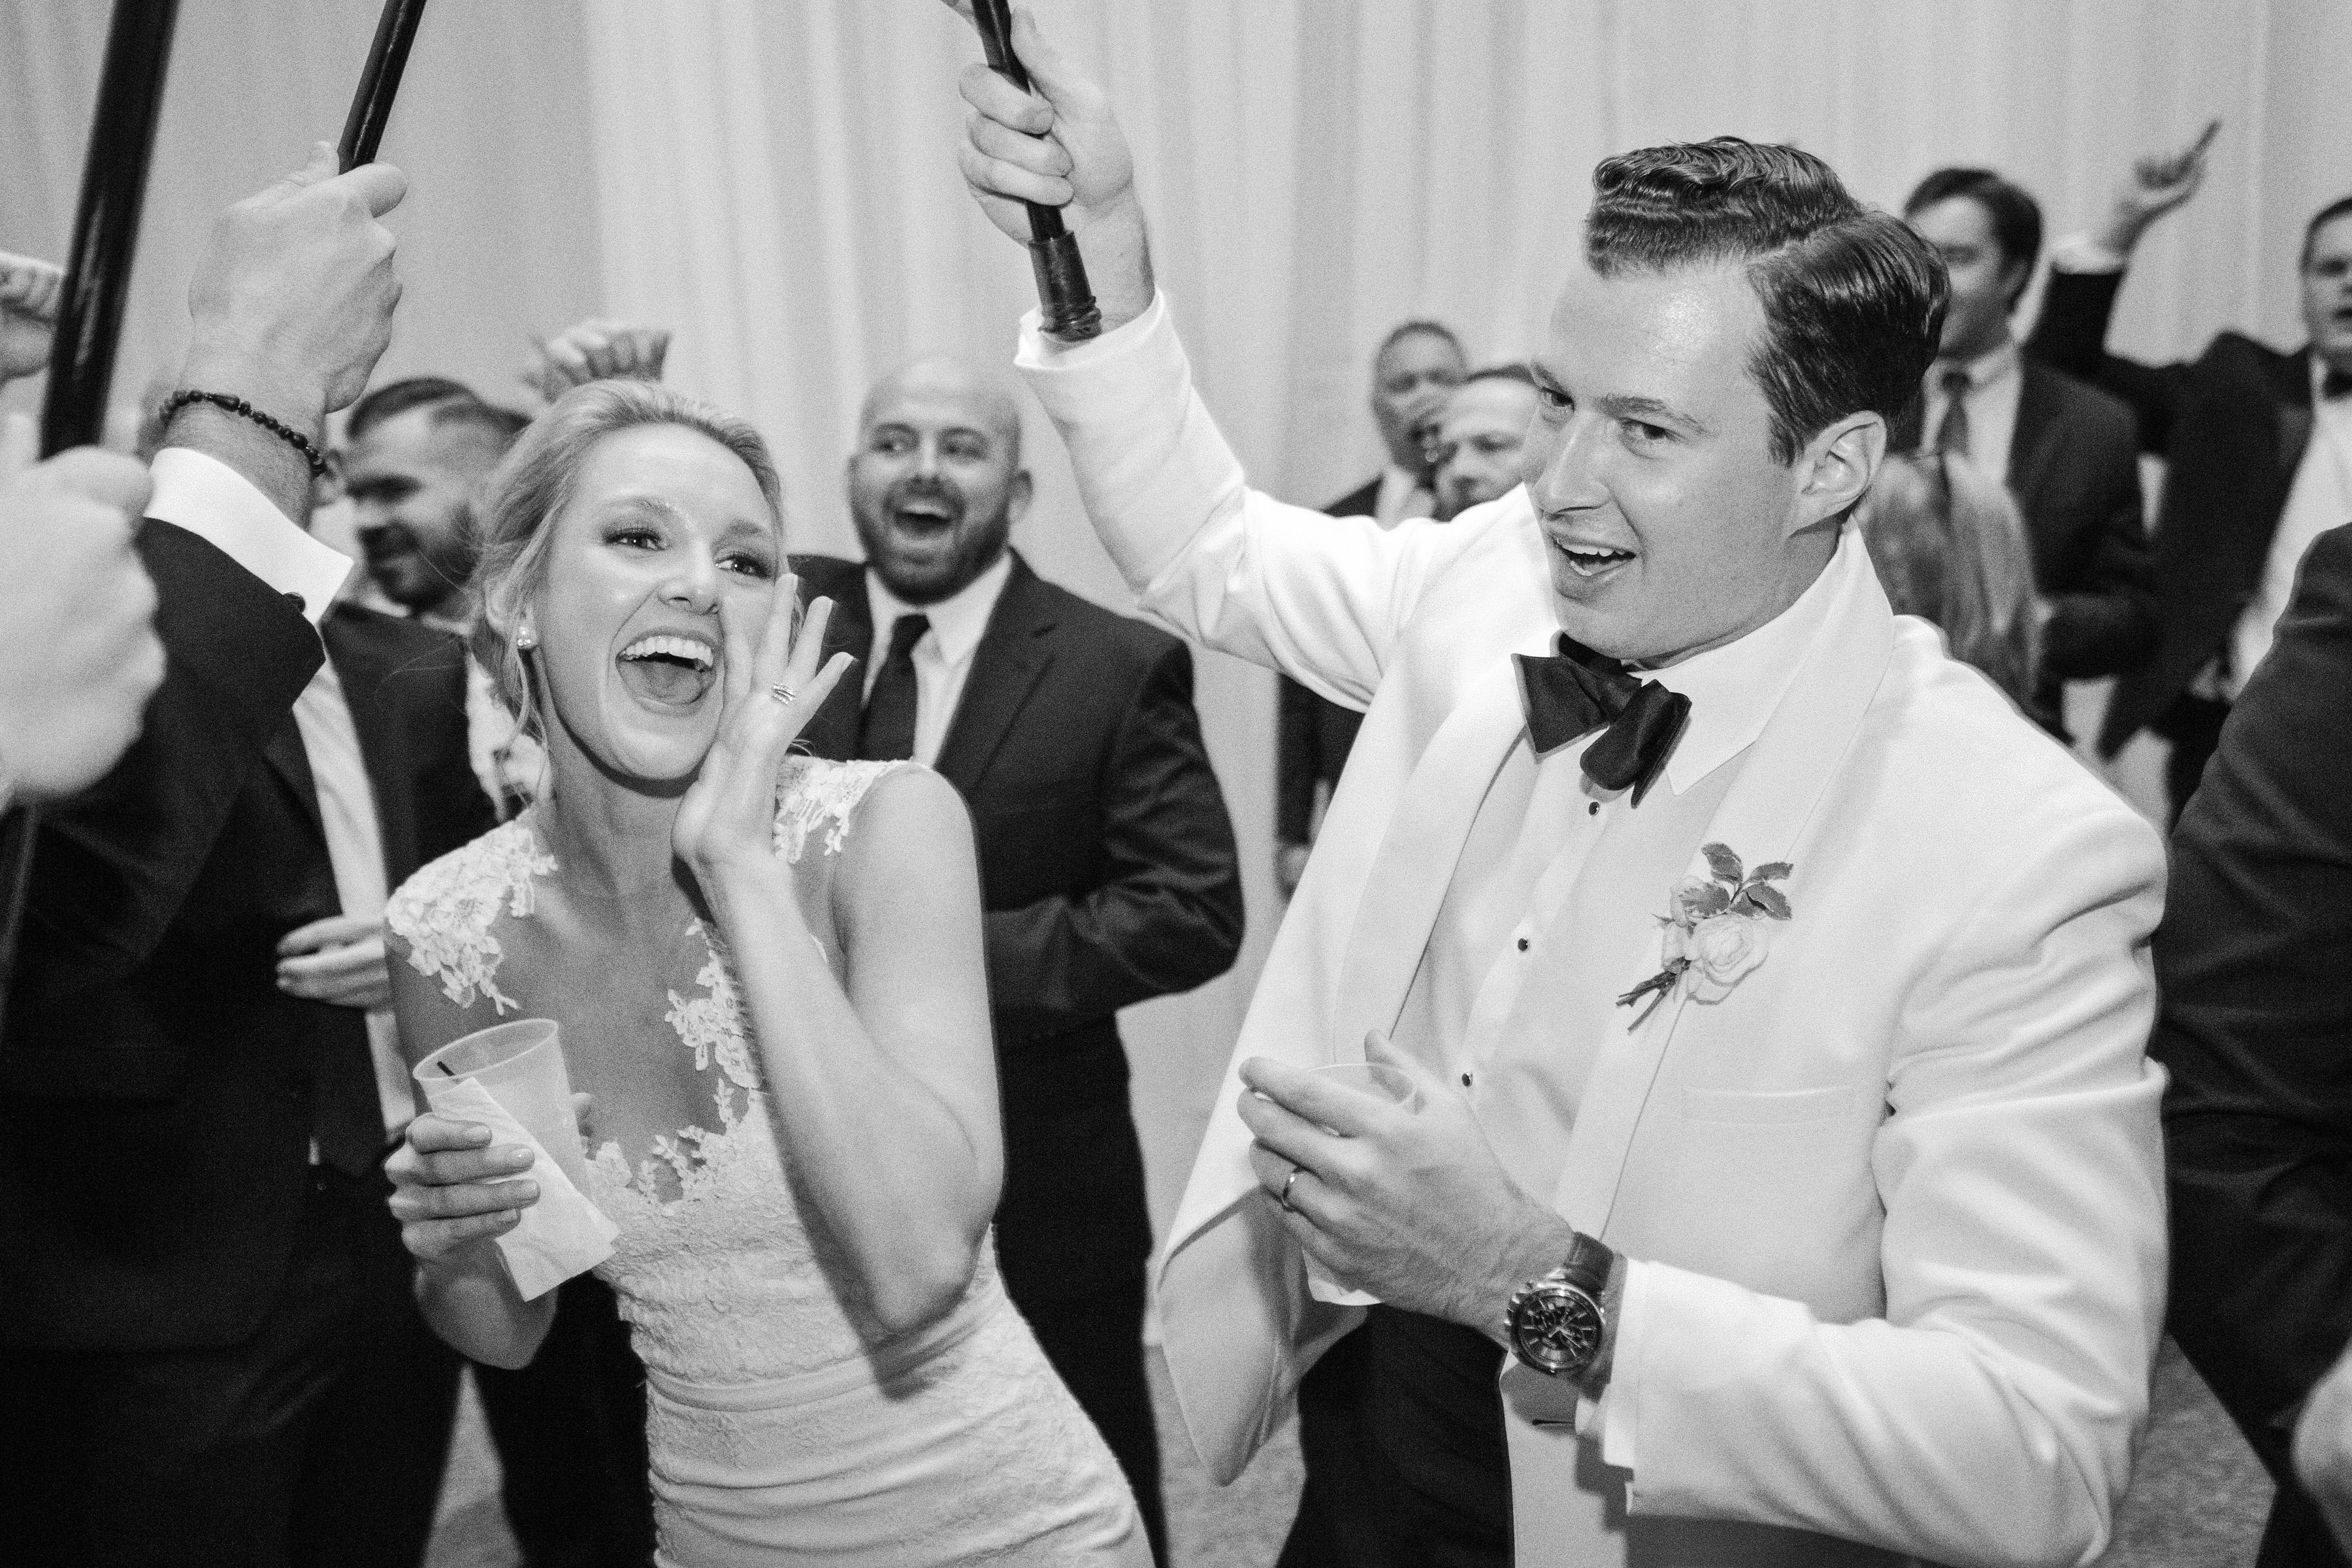 0544 Anna & John: A Clean and Modern Wedding at the Birmingham Museum of Art Uncategorized    invision_events, birmingham_al, auburn_al, alabama, atlanta_ga, atl, georgia, wedding_planner, wedding_designer, weddings, photography, wedding_planning